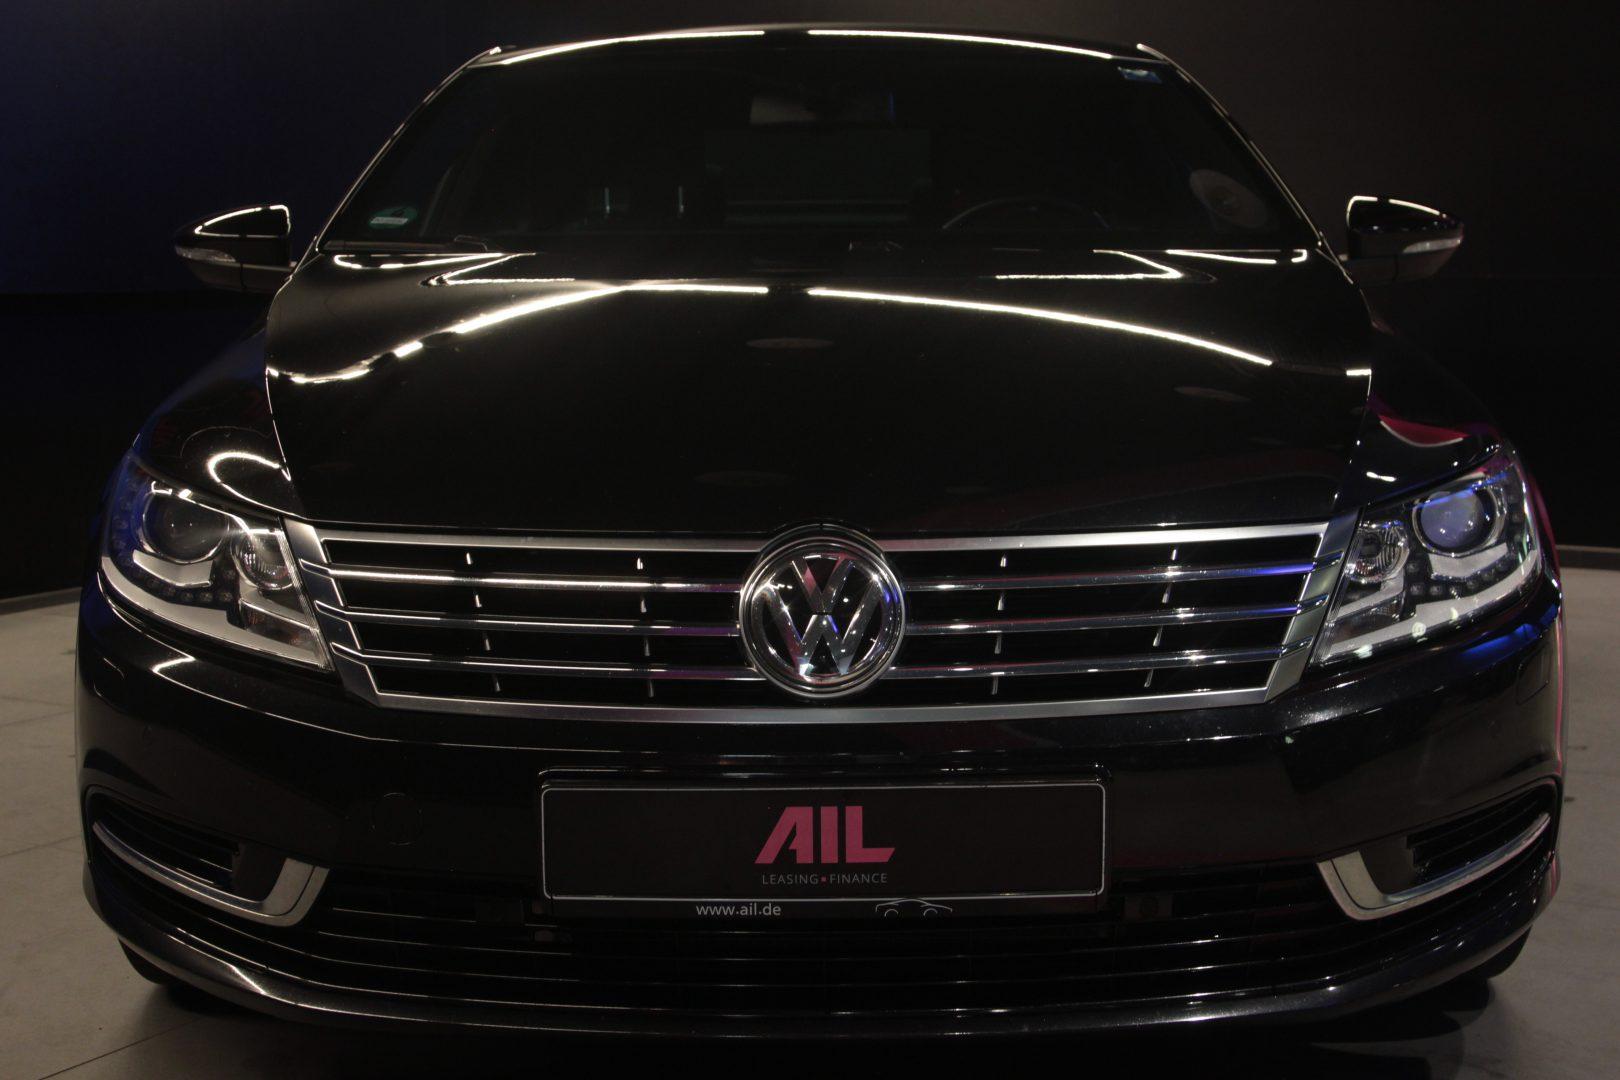 AIL VW CC 2.0TDI Basis BMT 4Motion DSG 10